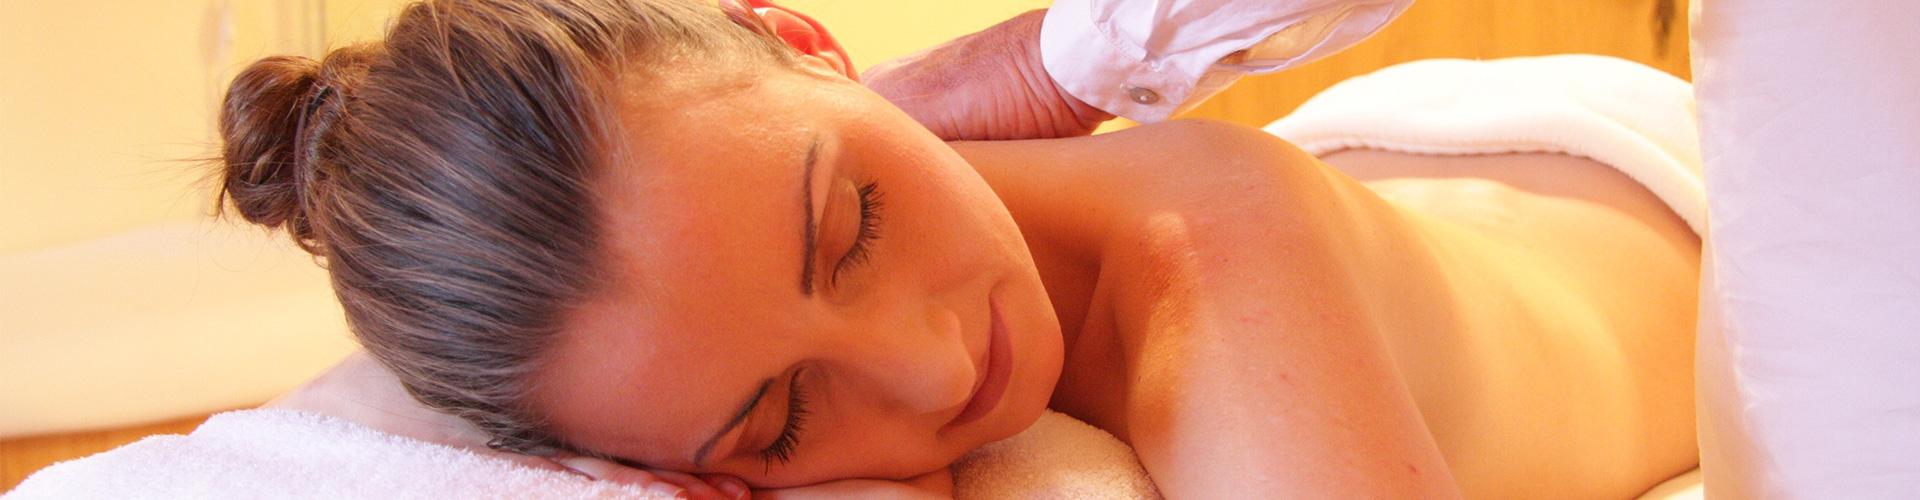 Therapiezentrum Petra Walk Physiotherapie Ostepathie Massage Presonal Training